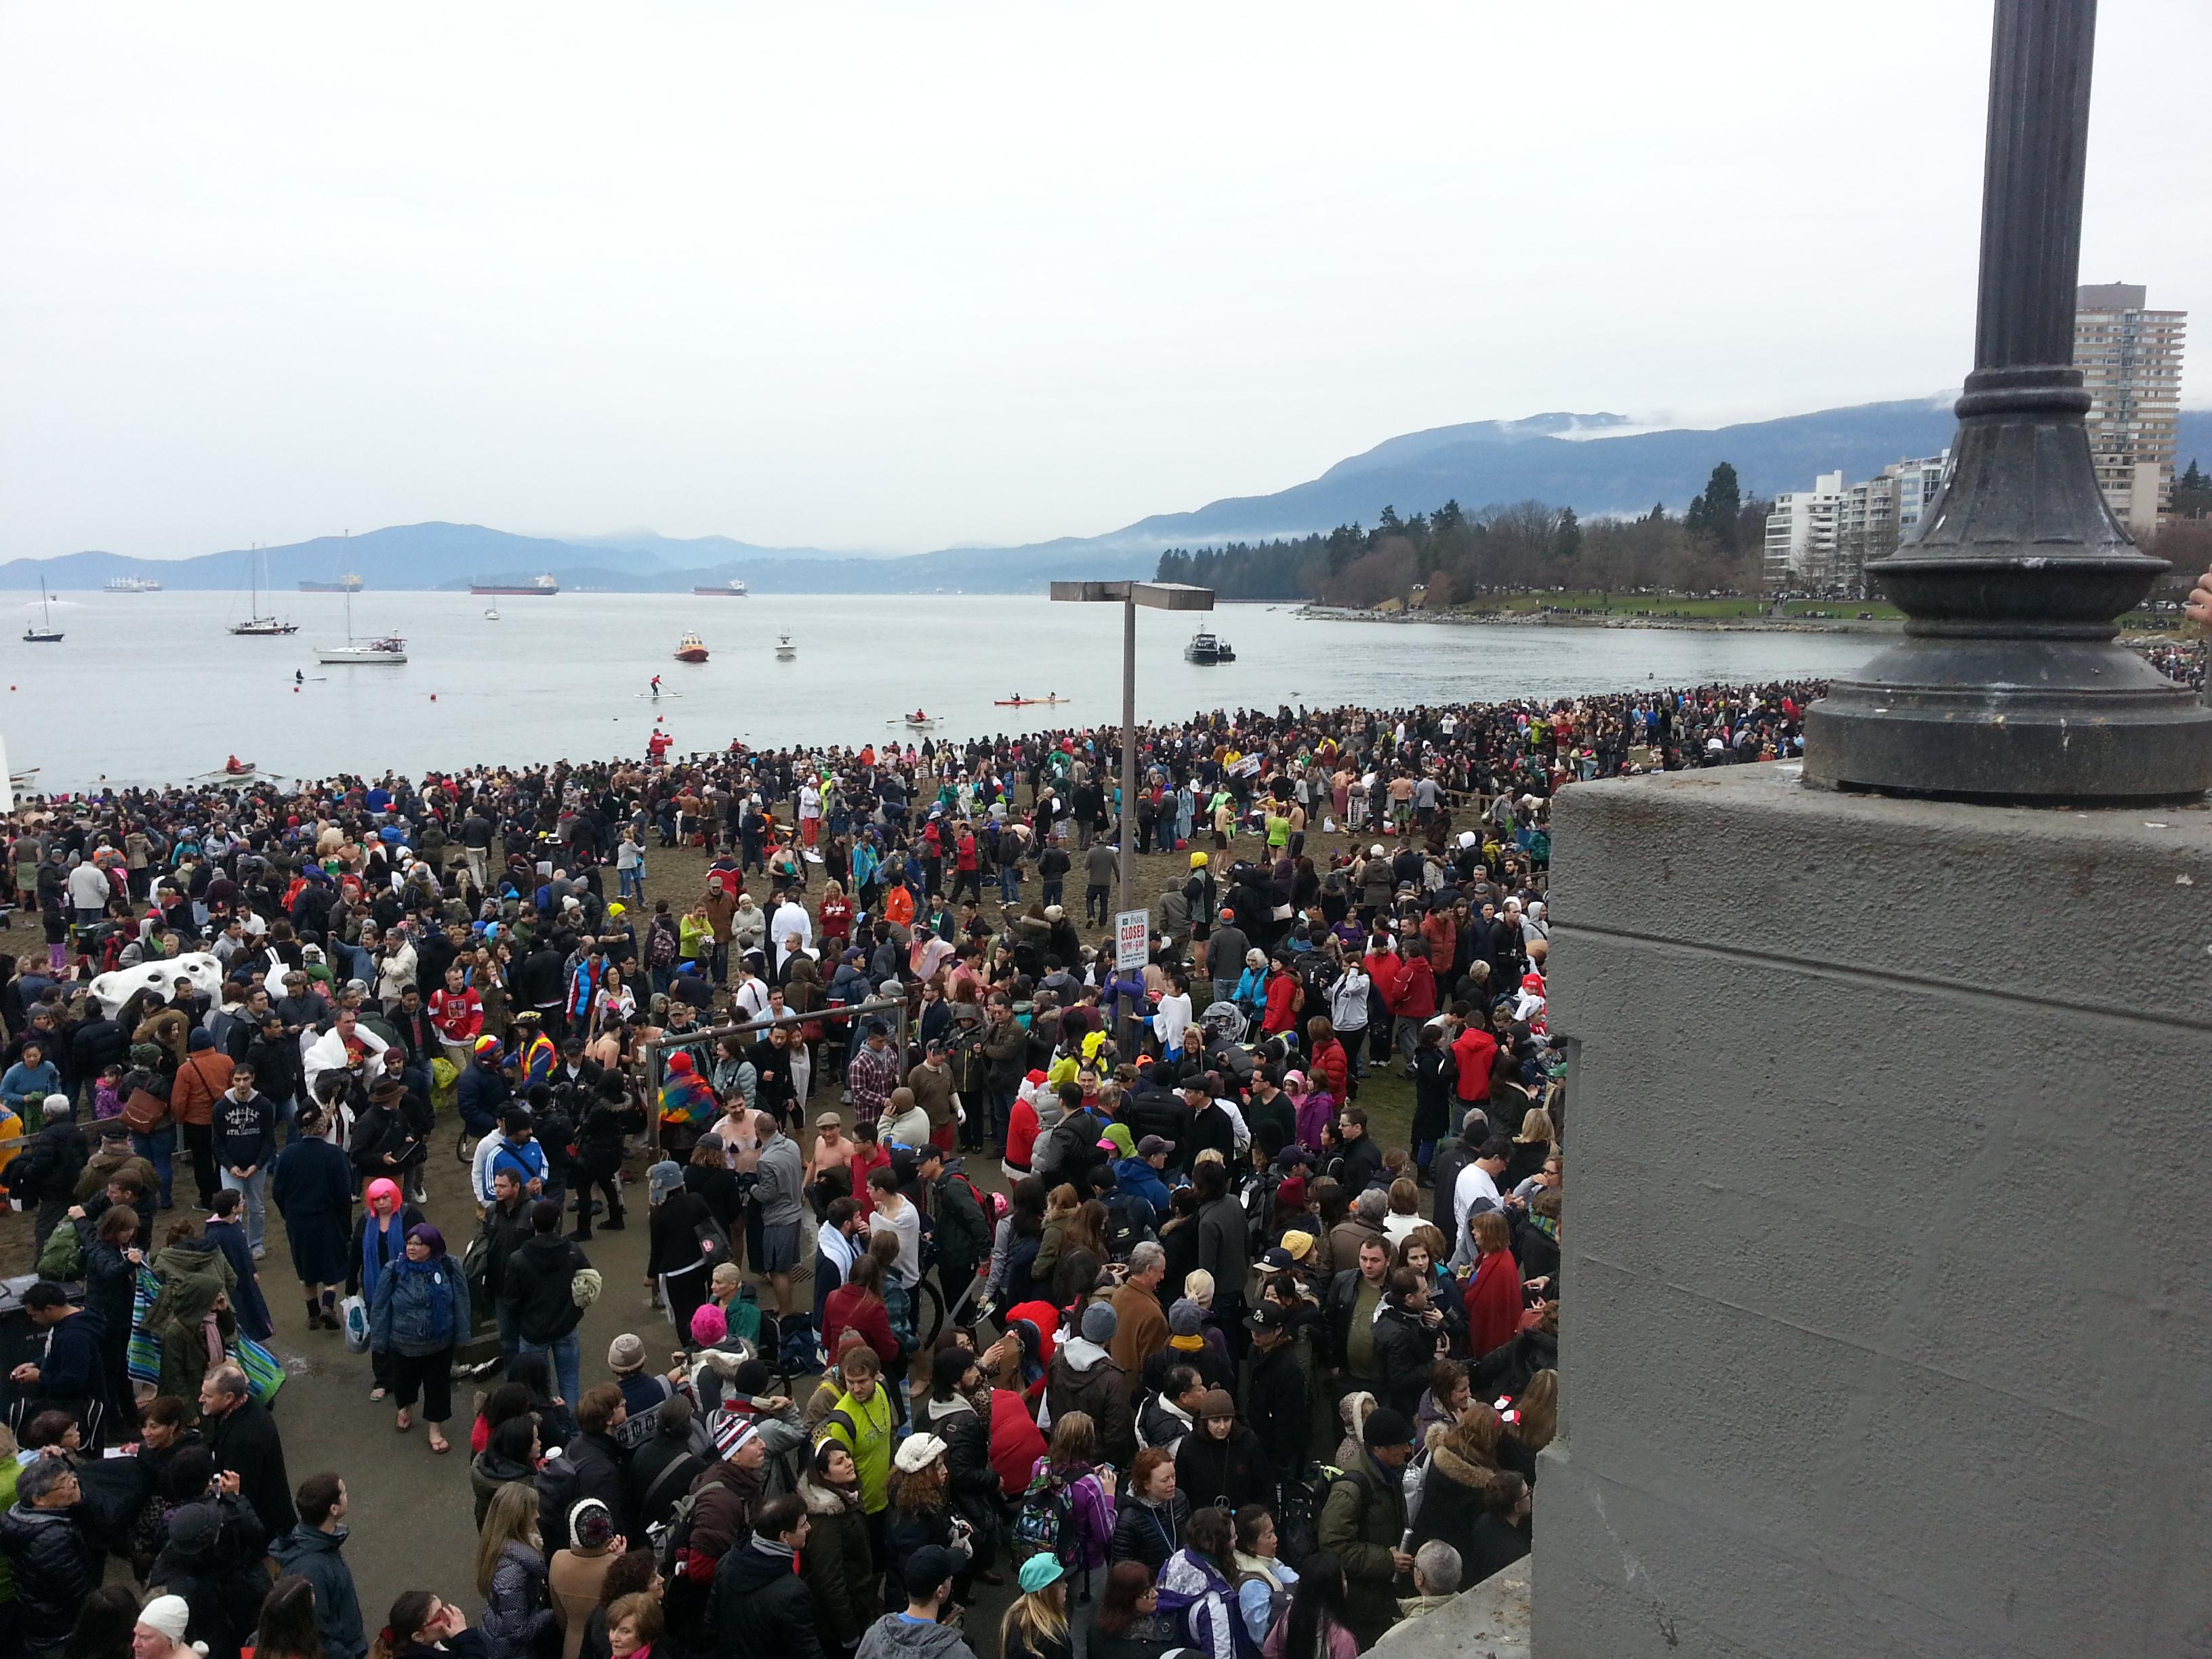 The crowd at English Bay for the 94th annual Polar Bear Swim (Jan 1/14)